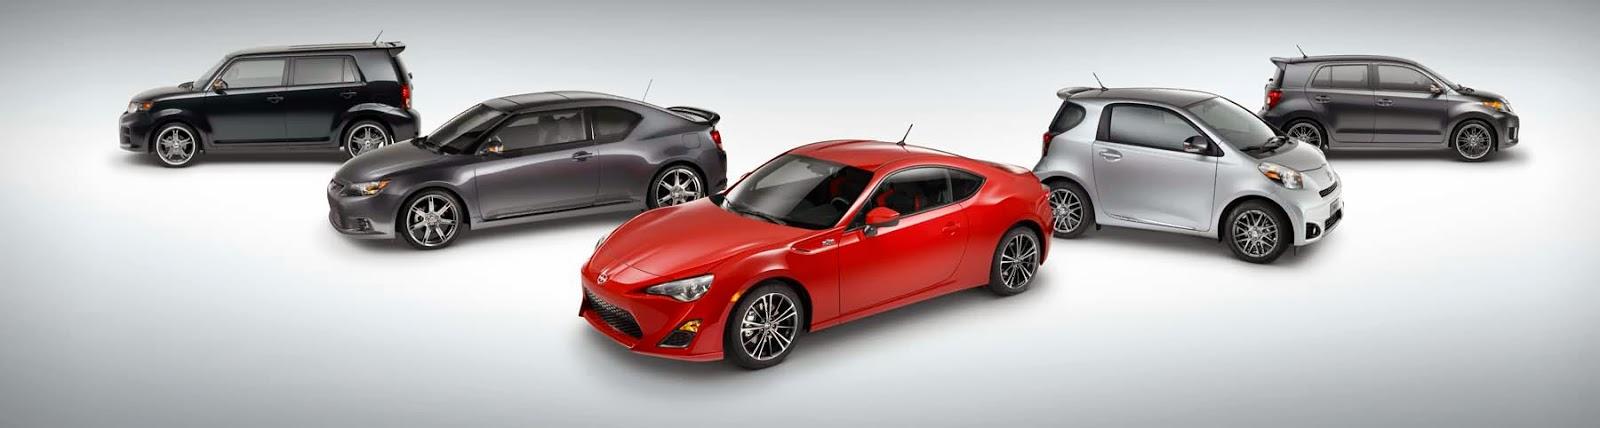 hoselton auto mall scion fr s best sports car for the money. Black Bedroom Furniture Sets. Home Design Ideas